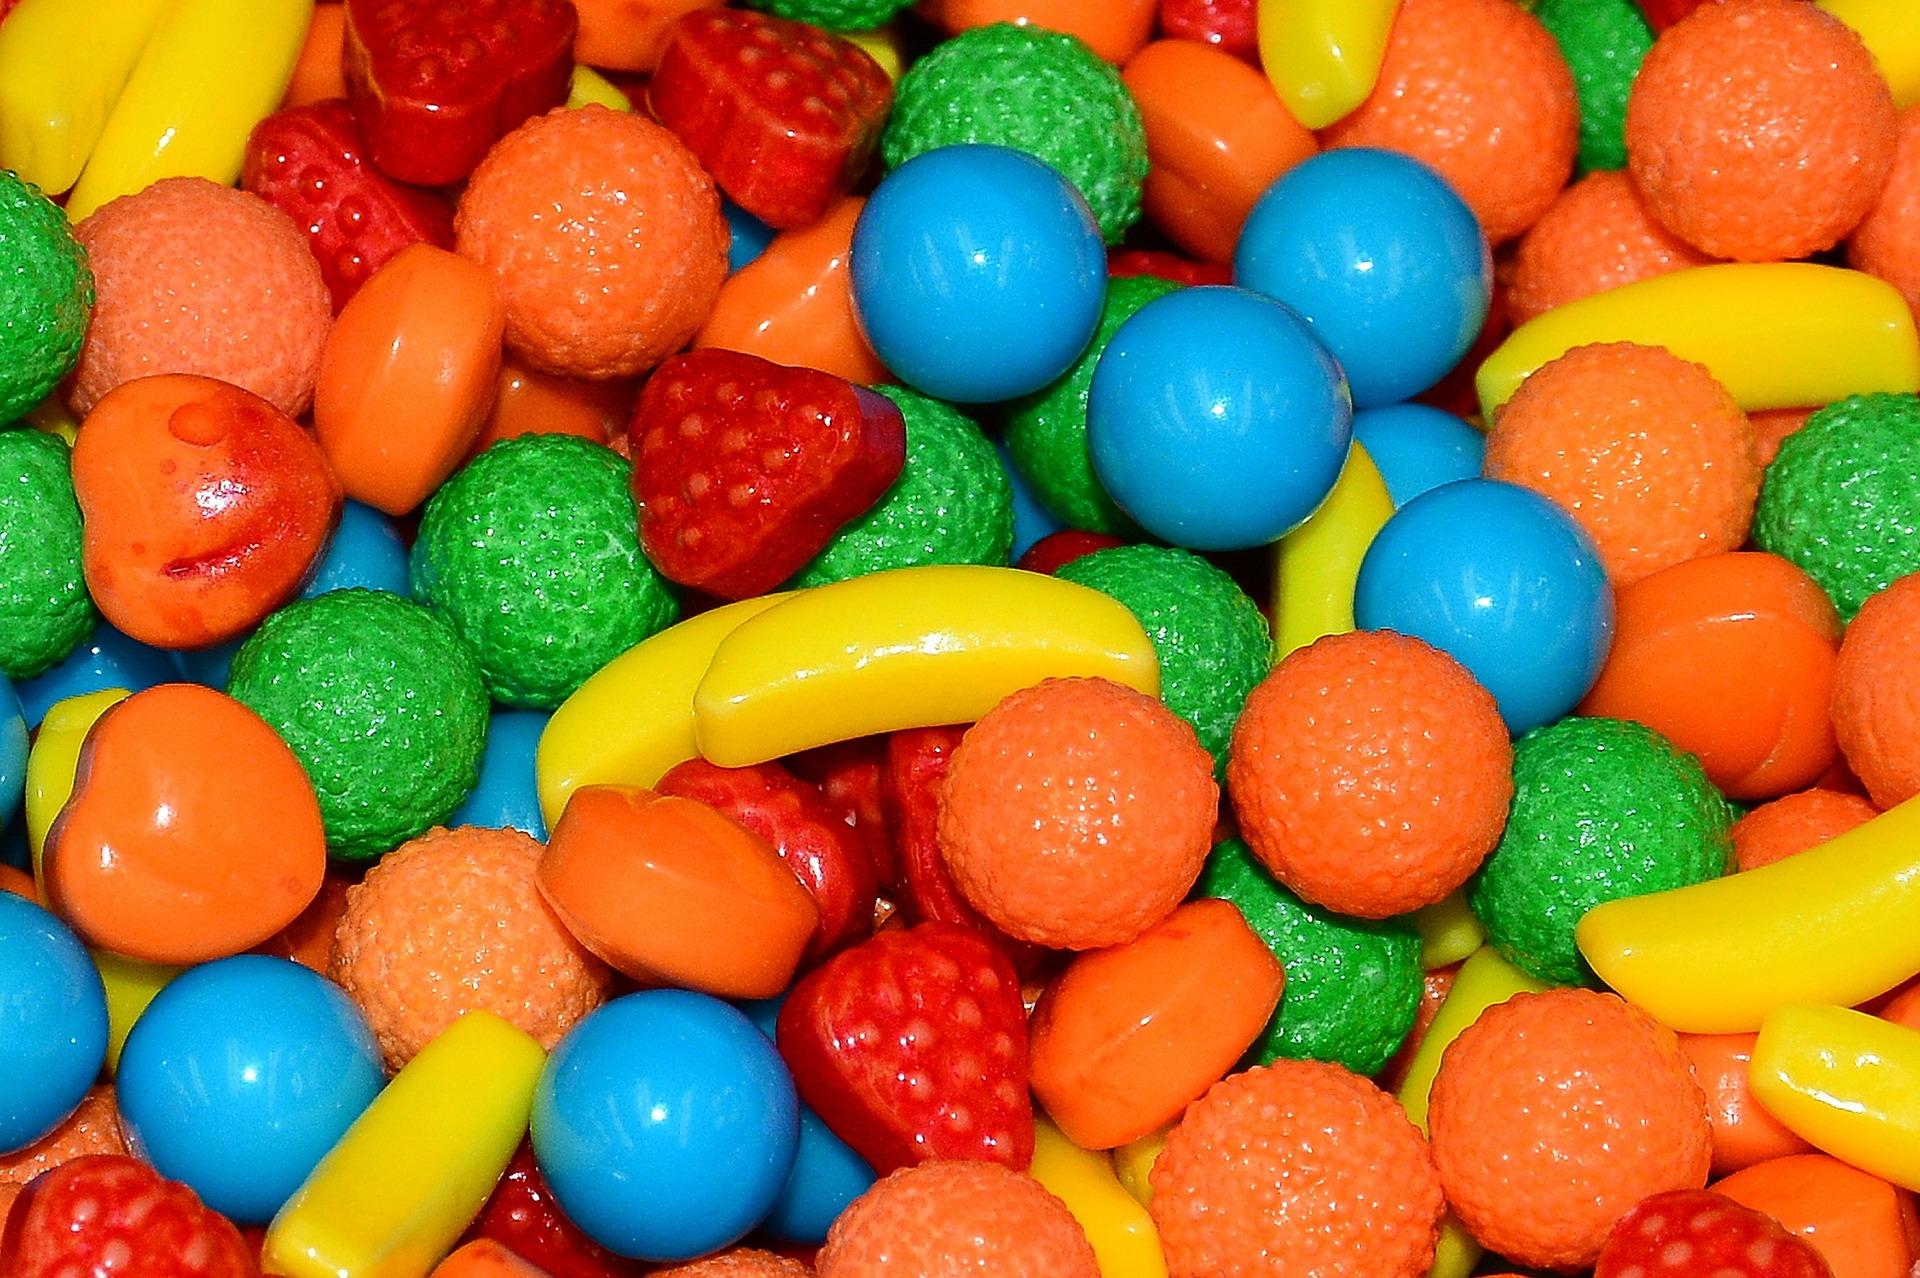 candy-1231201_1920.jpg